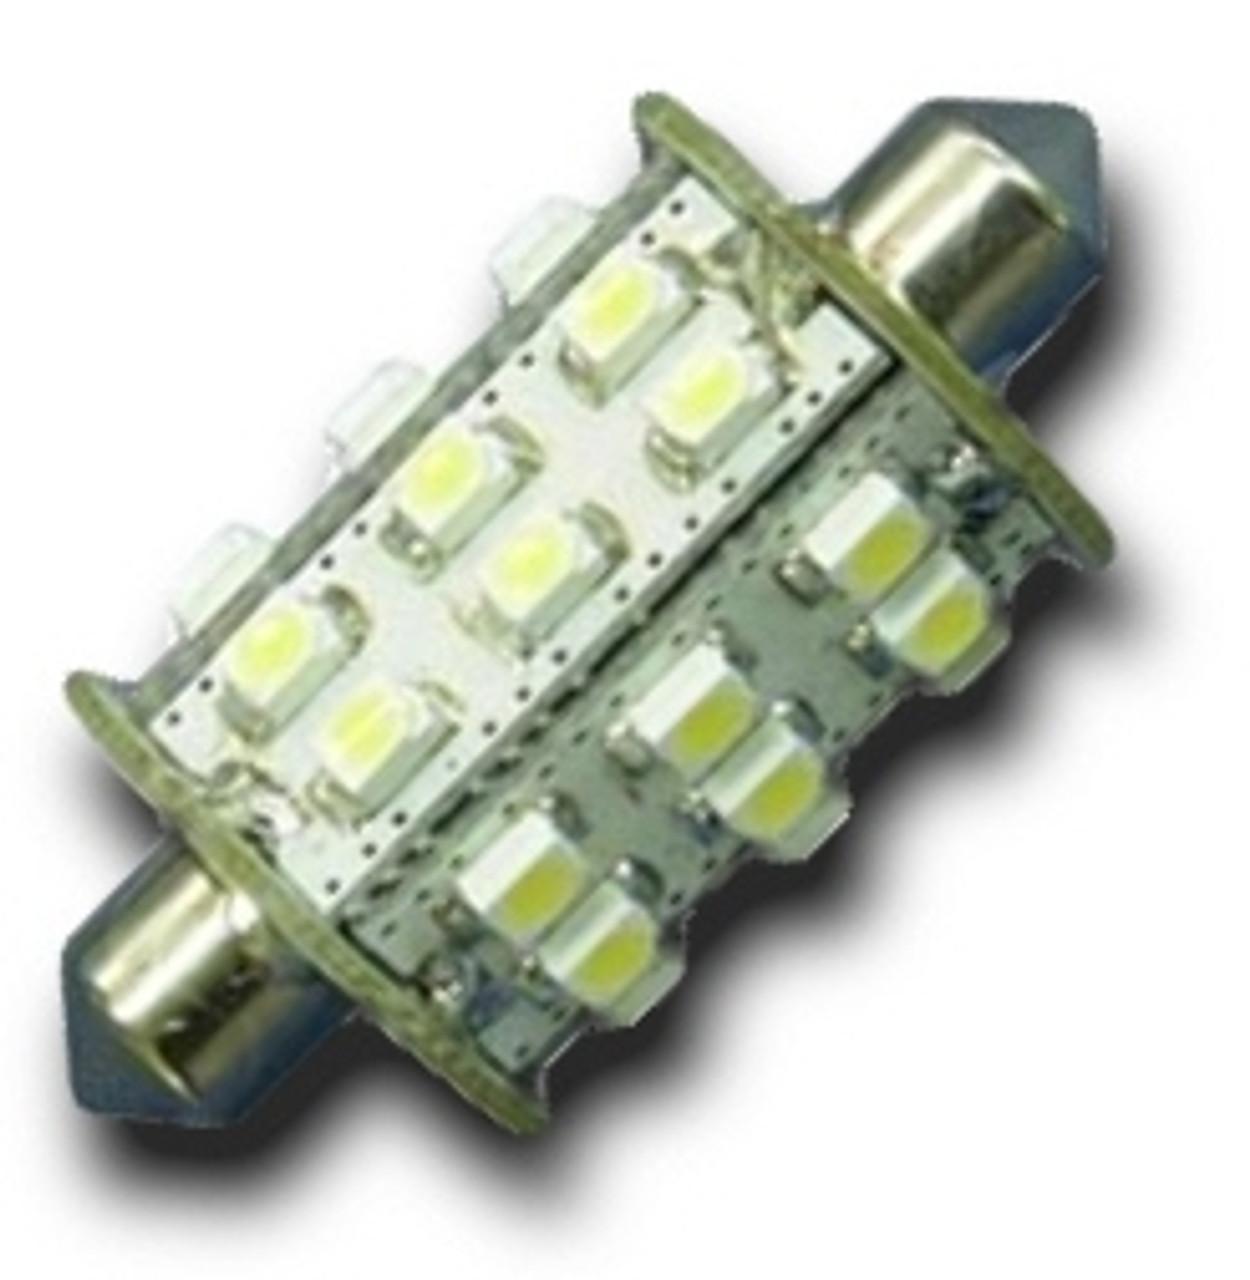 AQUASIGNAL 44 Stern Light LED Black 10-30V